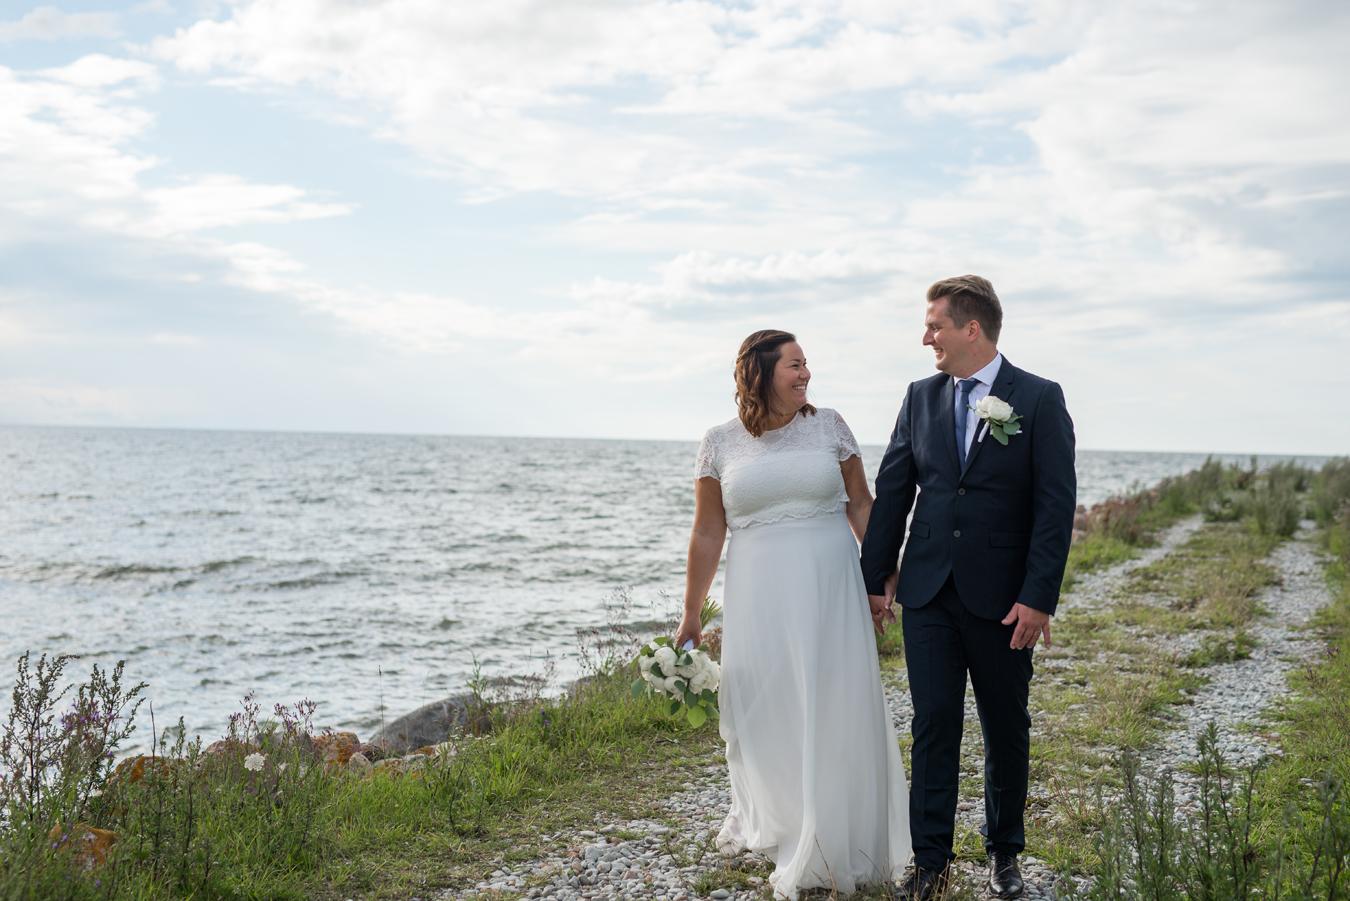 112-bröllopsfotograf-gotland-ekstakusten-neas-fotografi.jpg